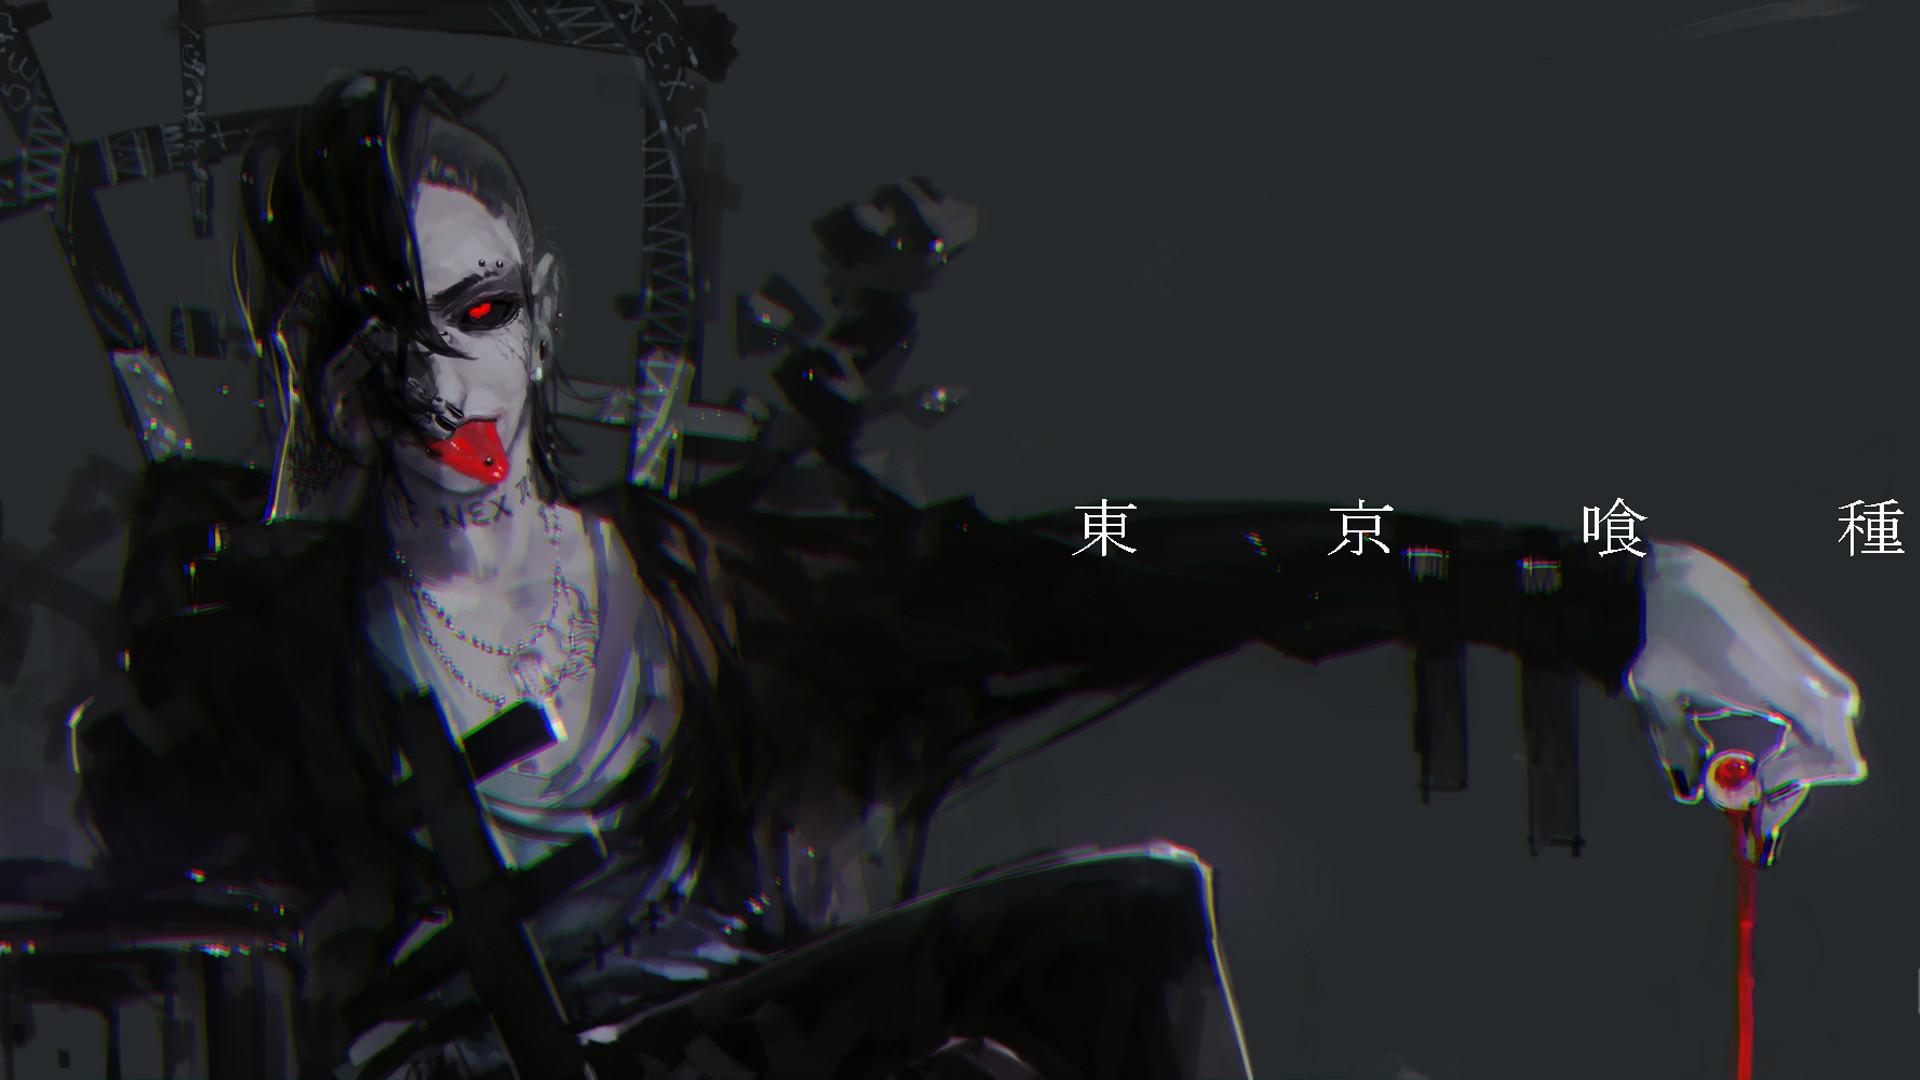 uta tokyo ghoul wallpaper – Szukaj w Google